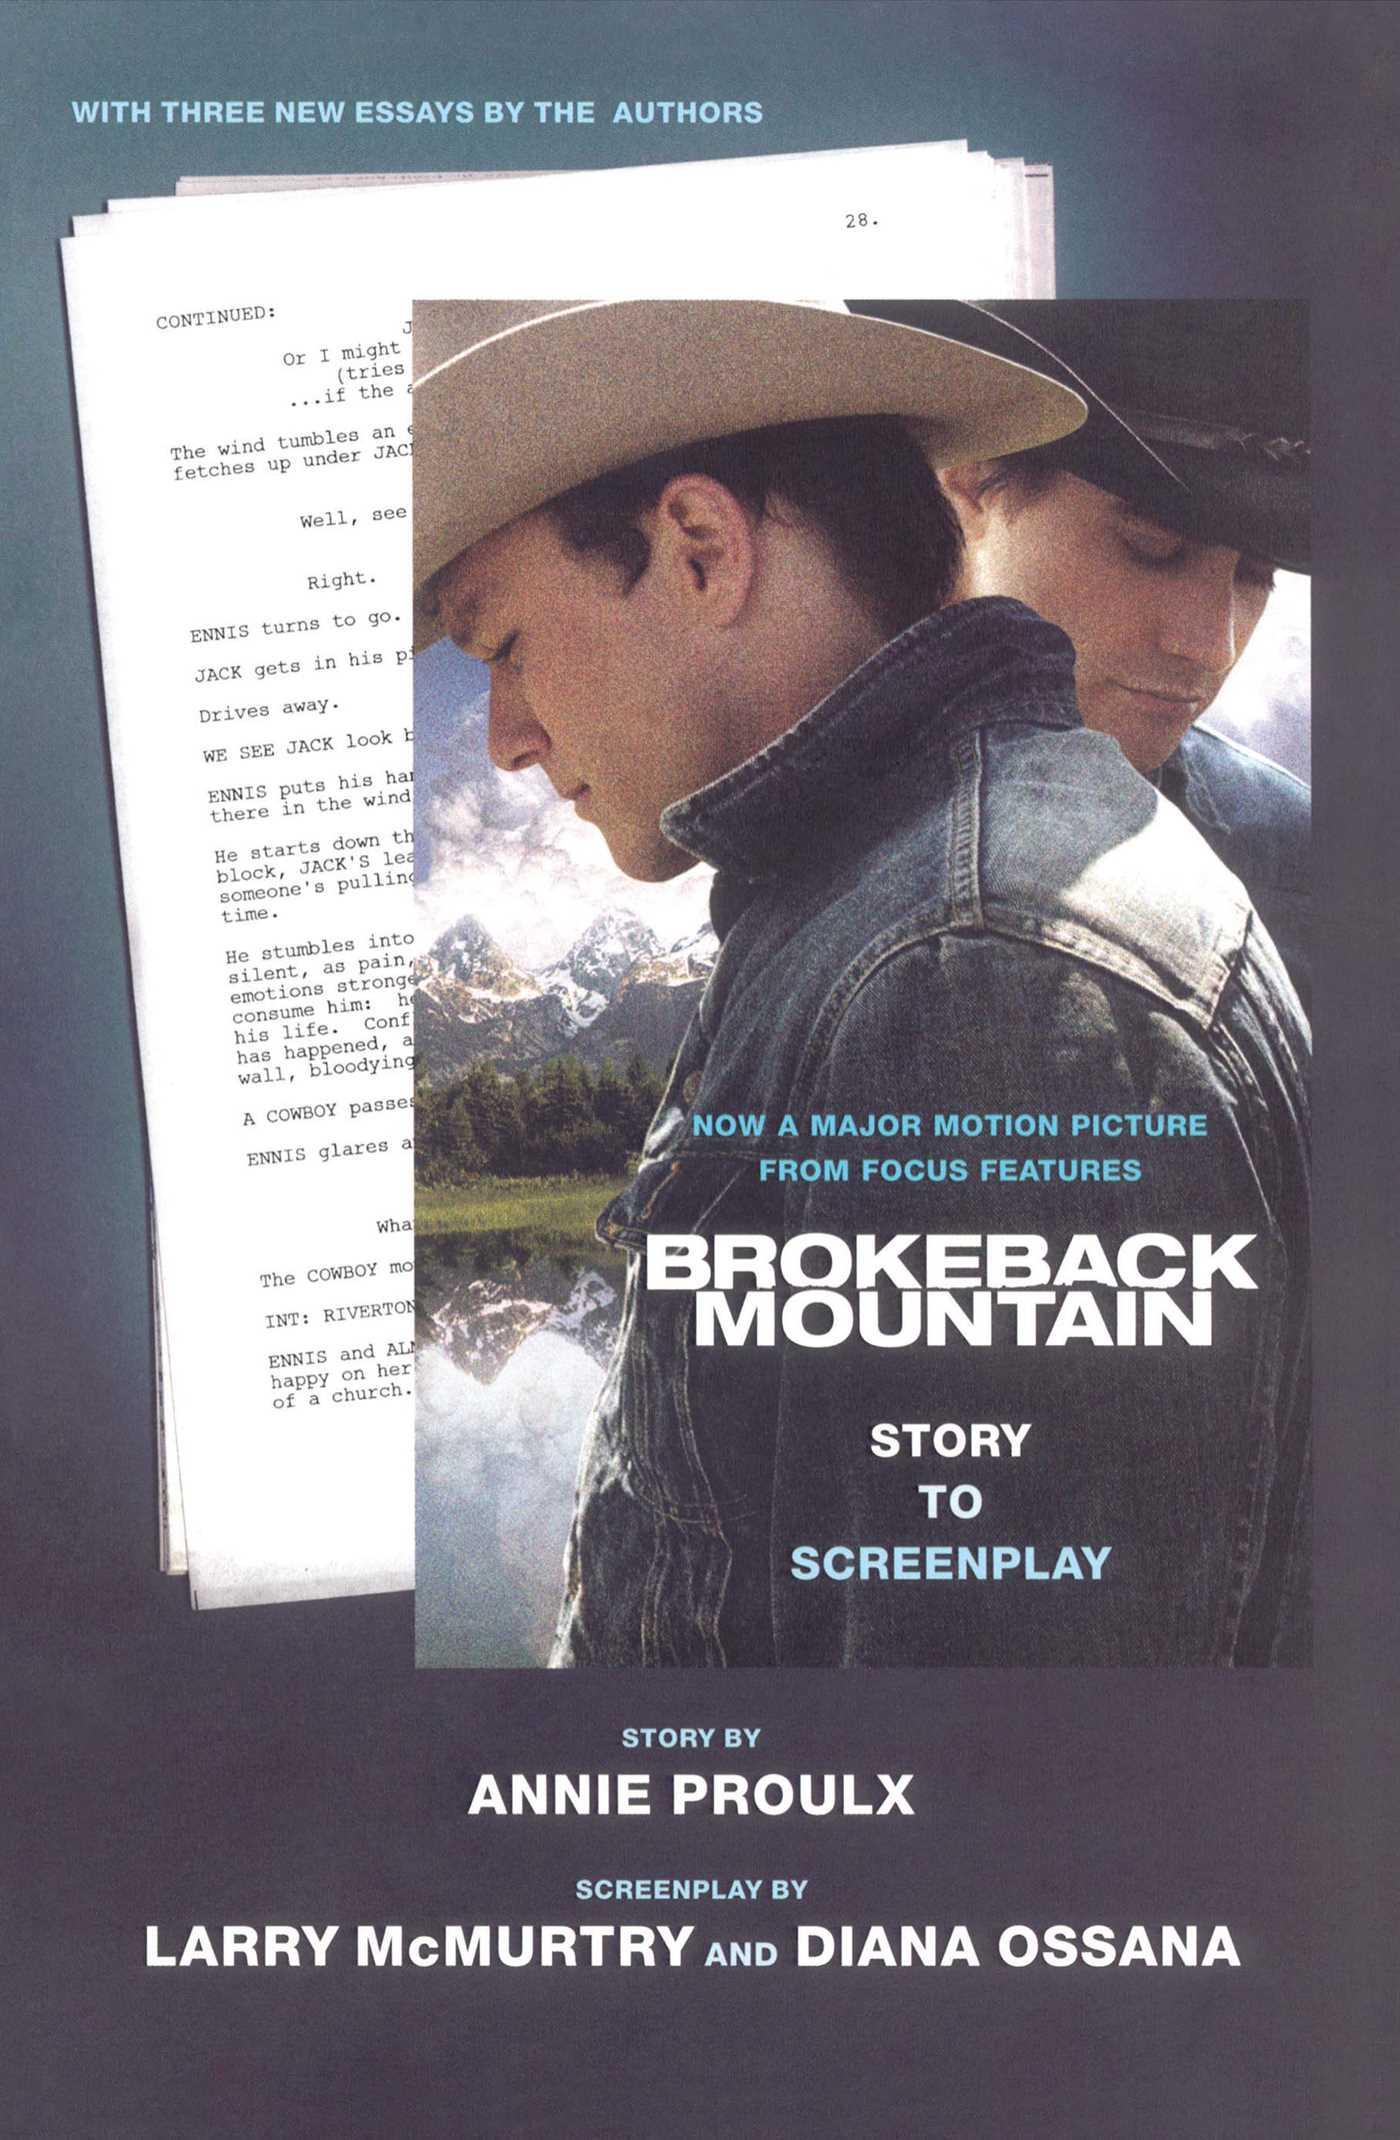 Brokeback mountain story to screenplay 9781439188576 hr